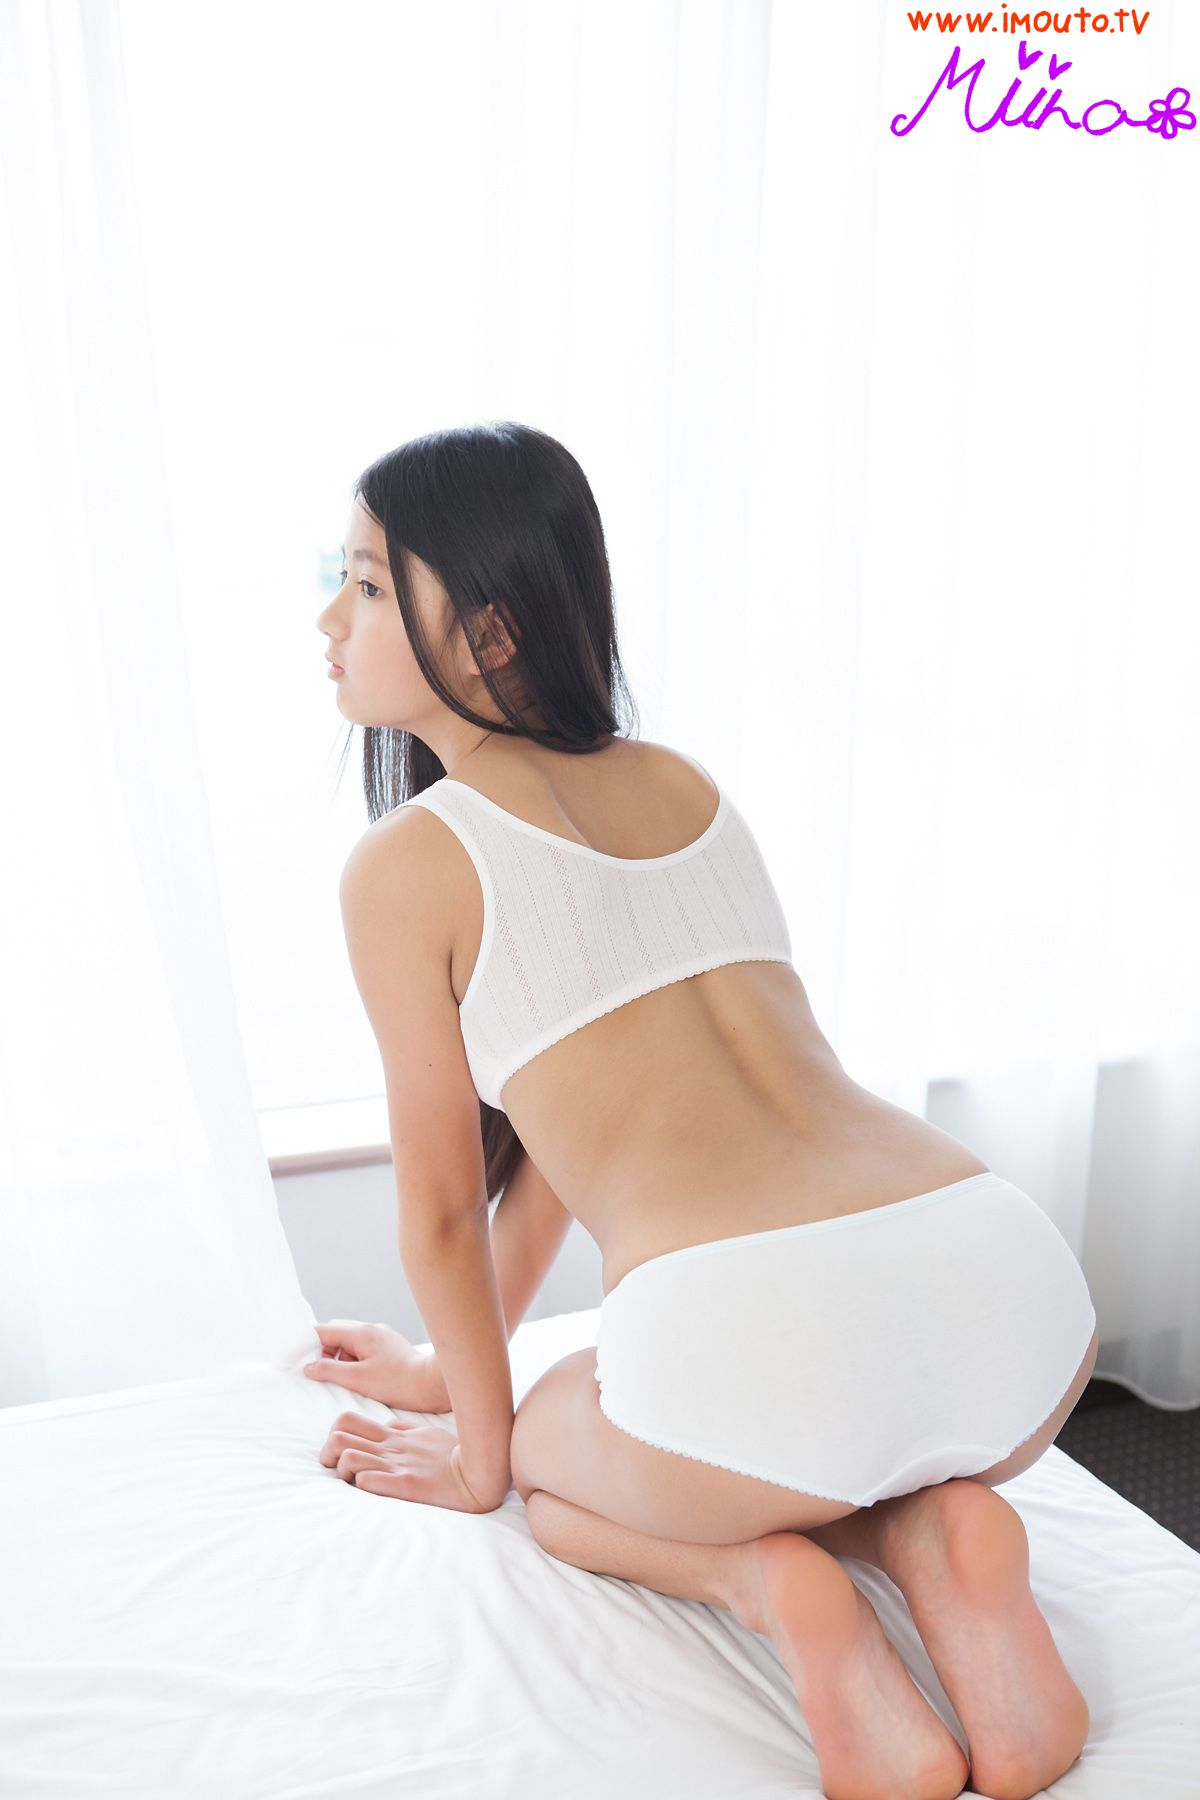 midget fucking free midget sex